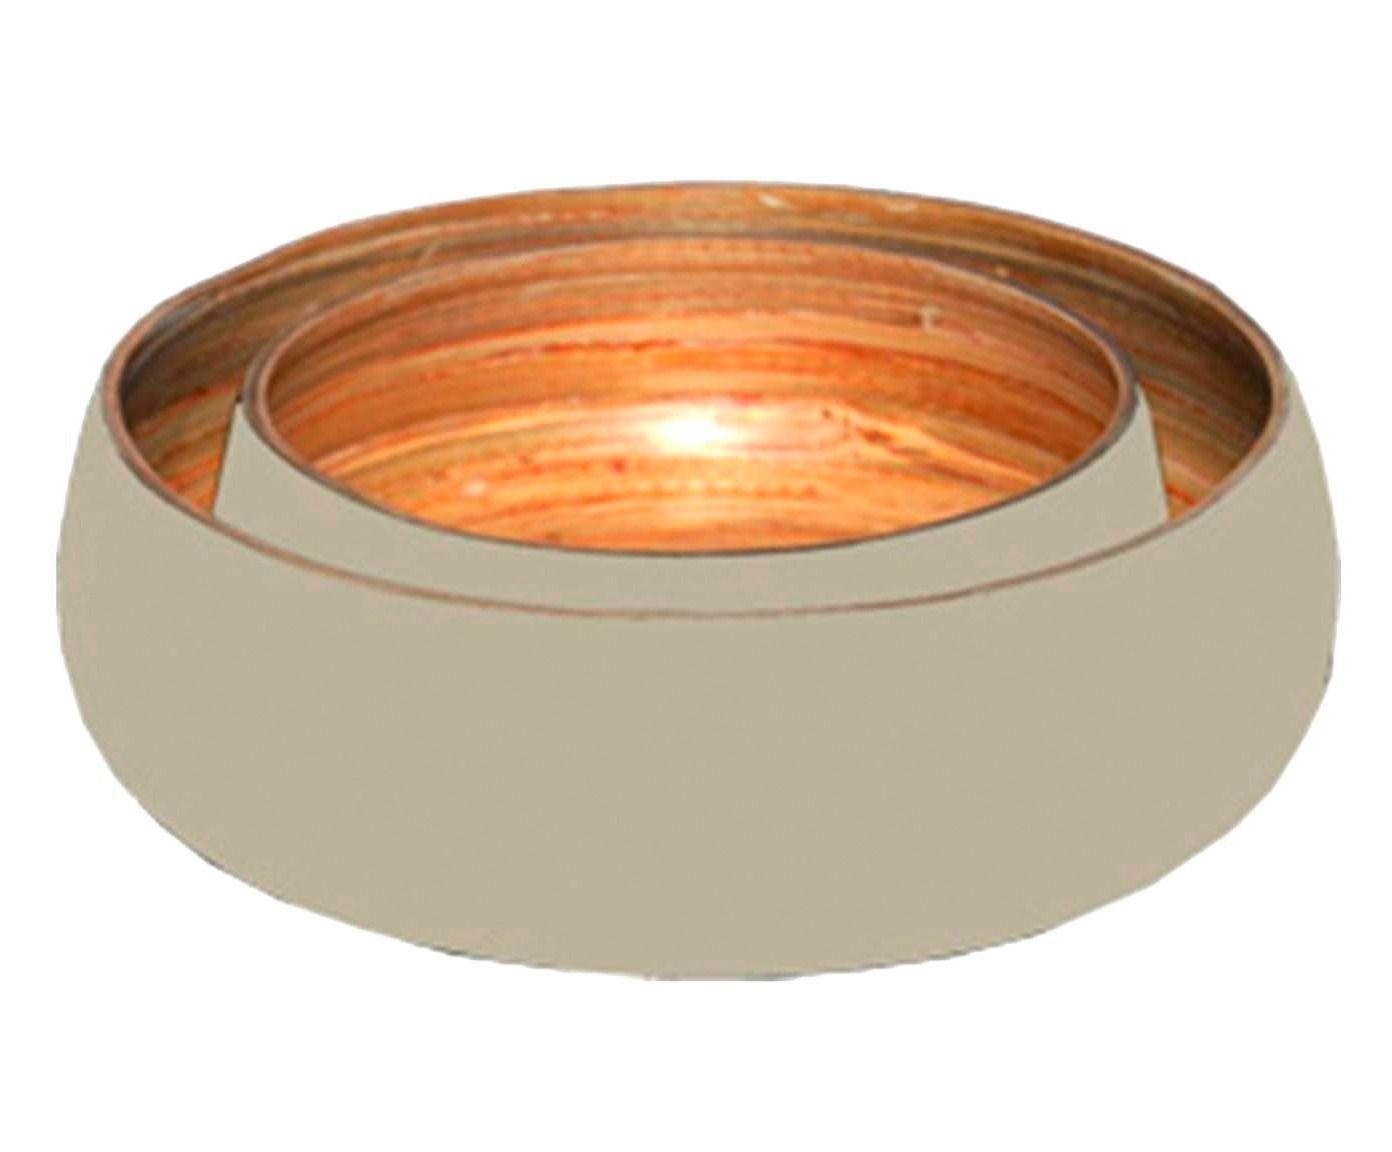 Conjunto de bowls kannie - lana | Westwing.com.br